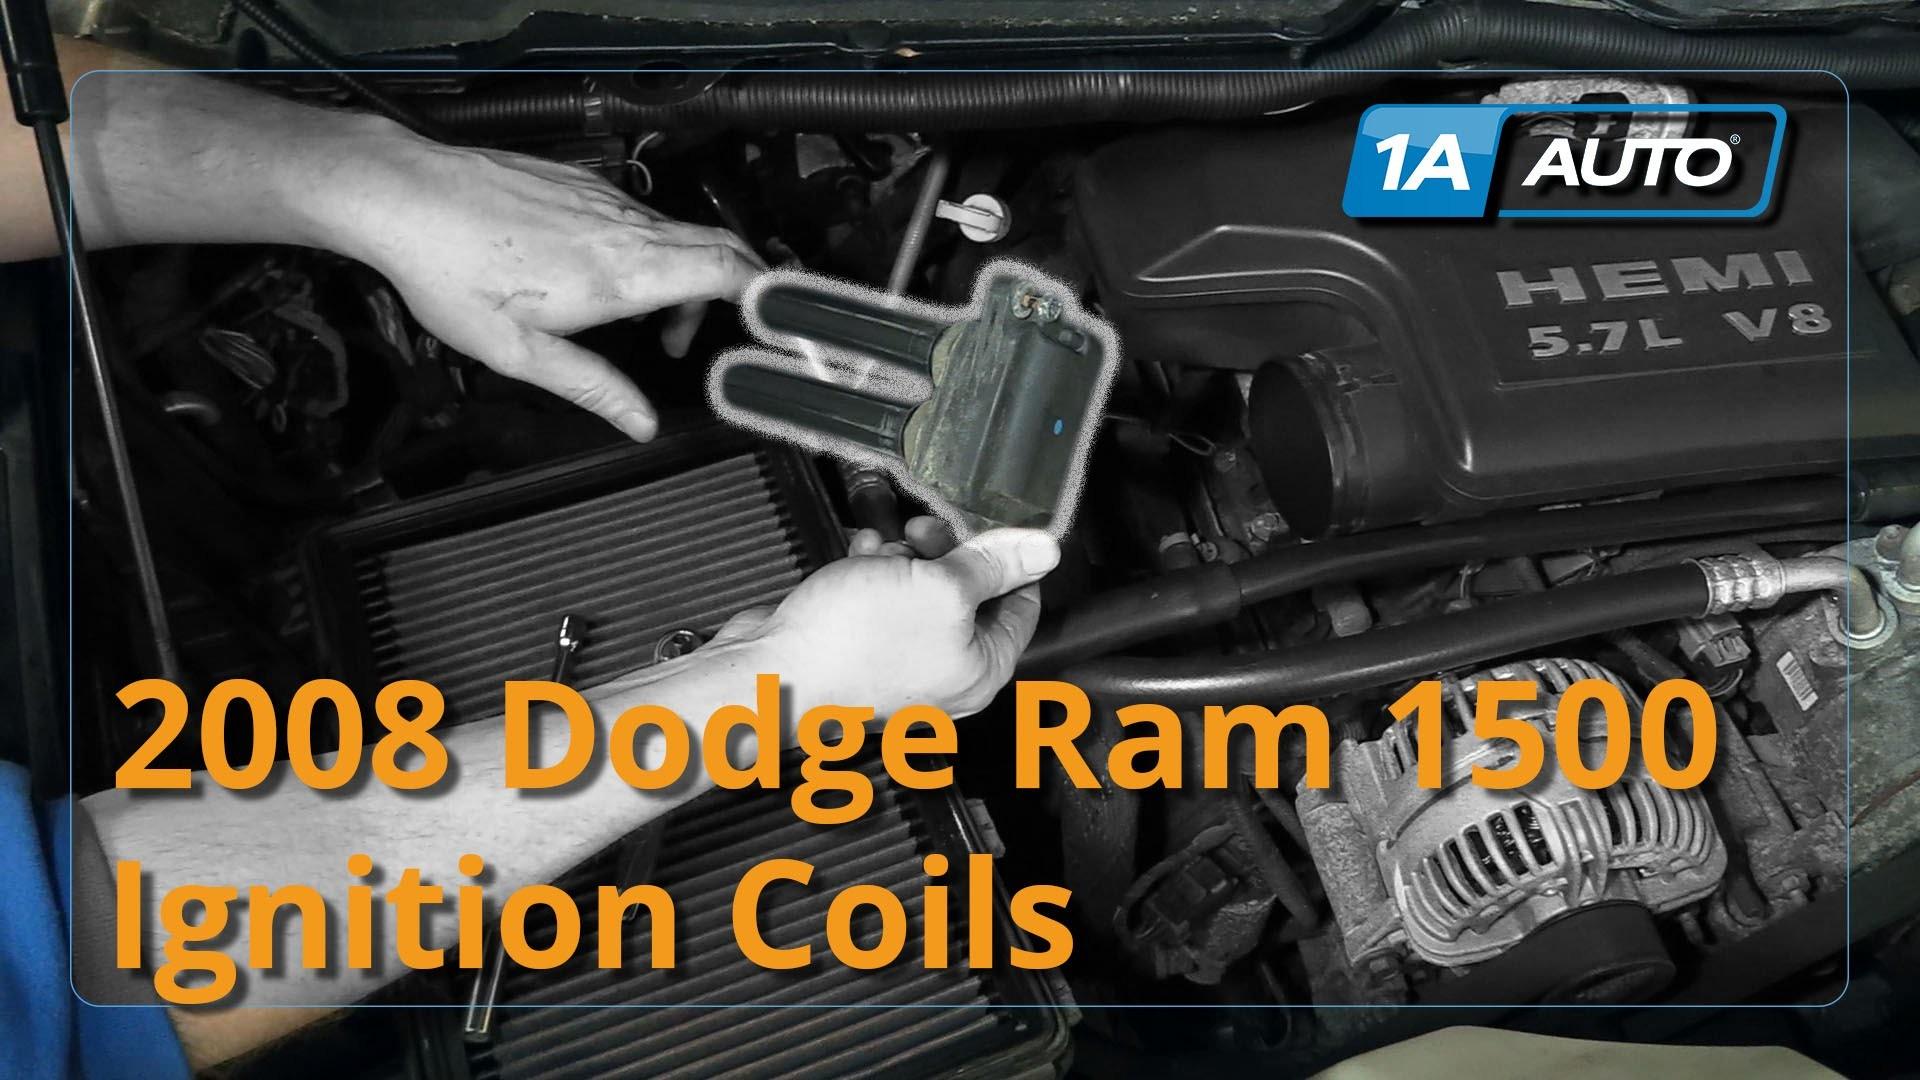 2005 Dodge Durango Engine Diagram How to Install Replace Ignition Coils Dodge  Ram 1500 Hemi 5 7l Buy